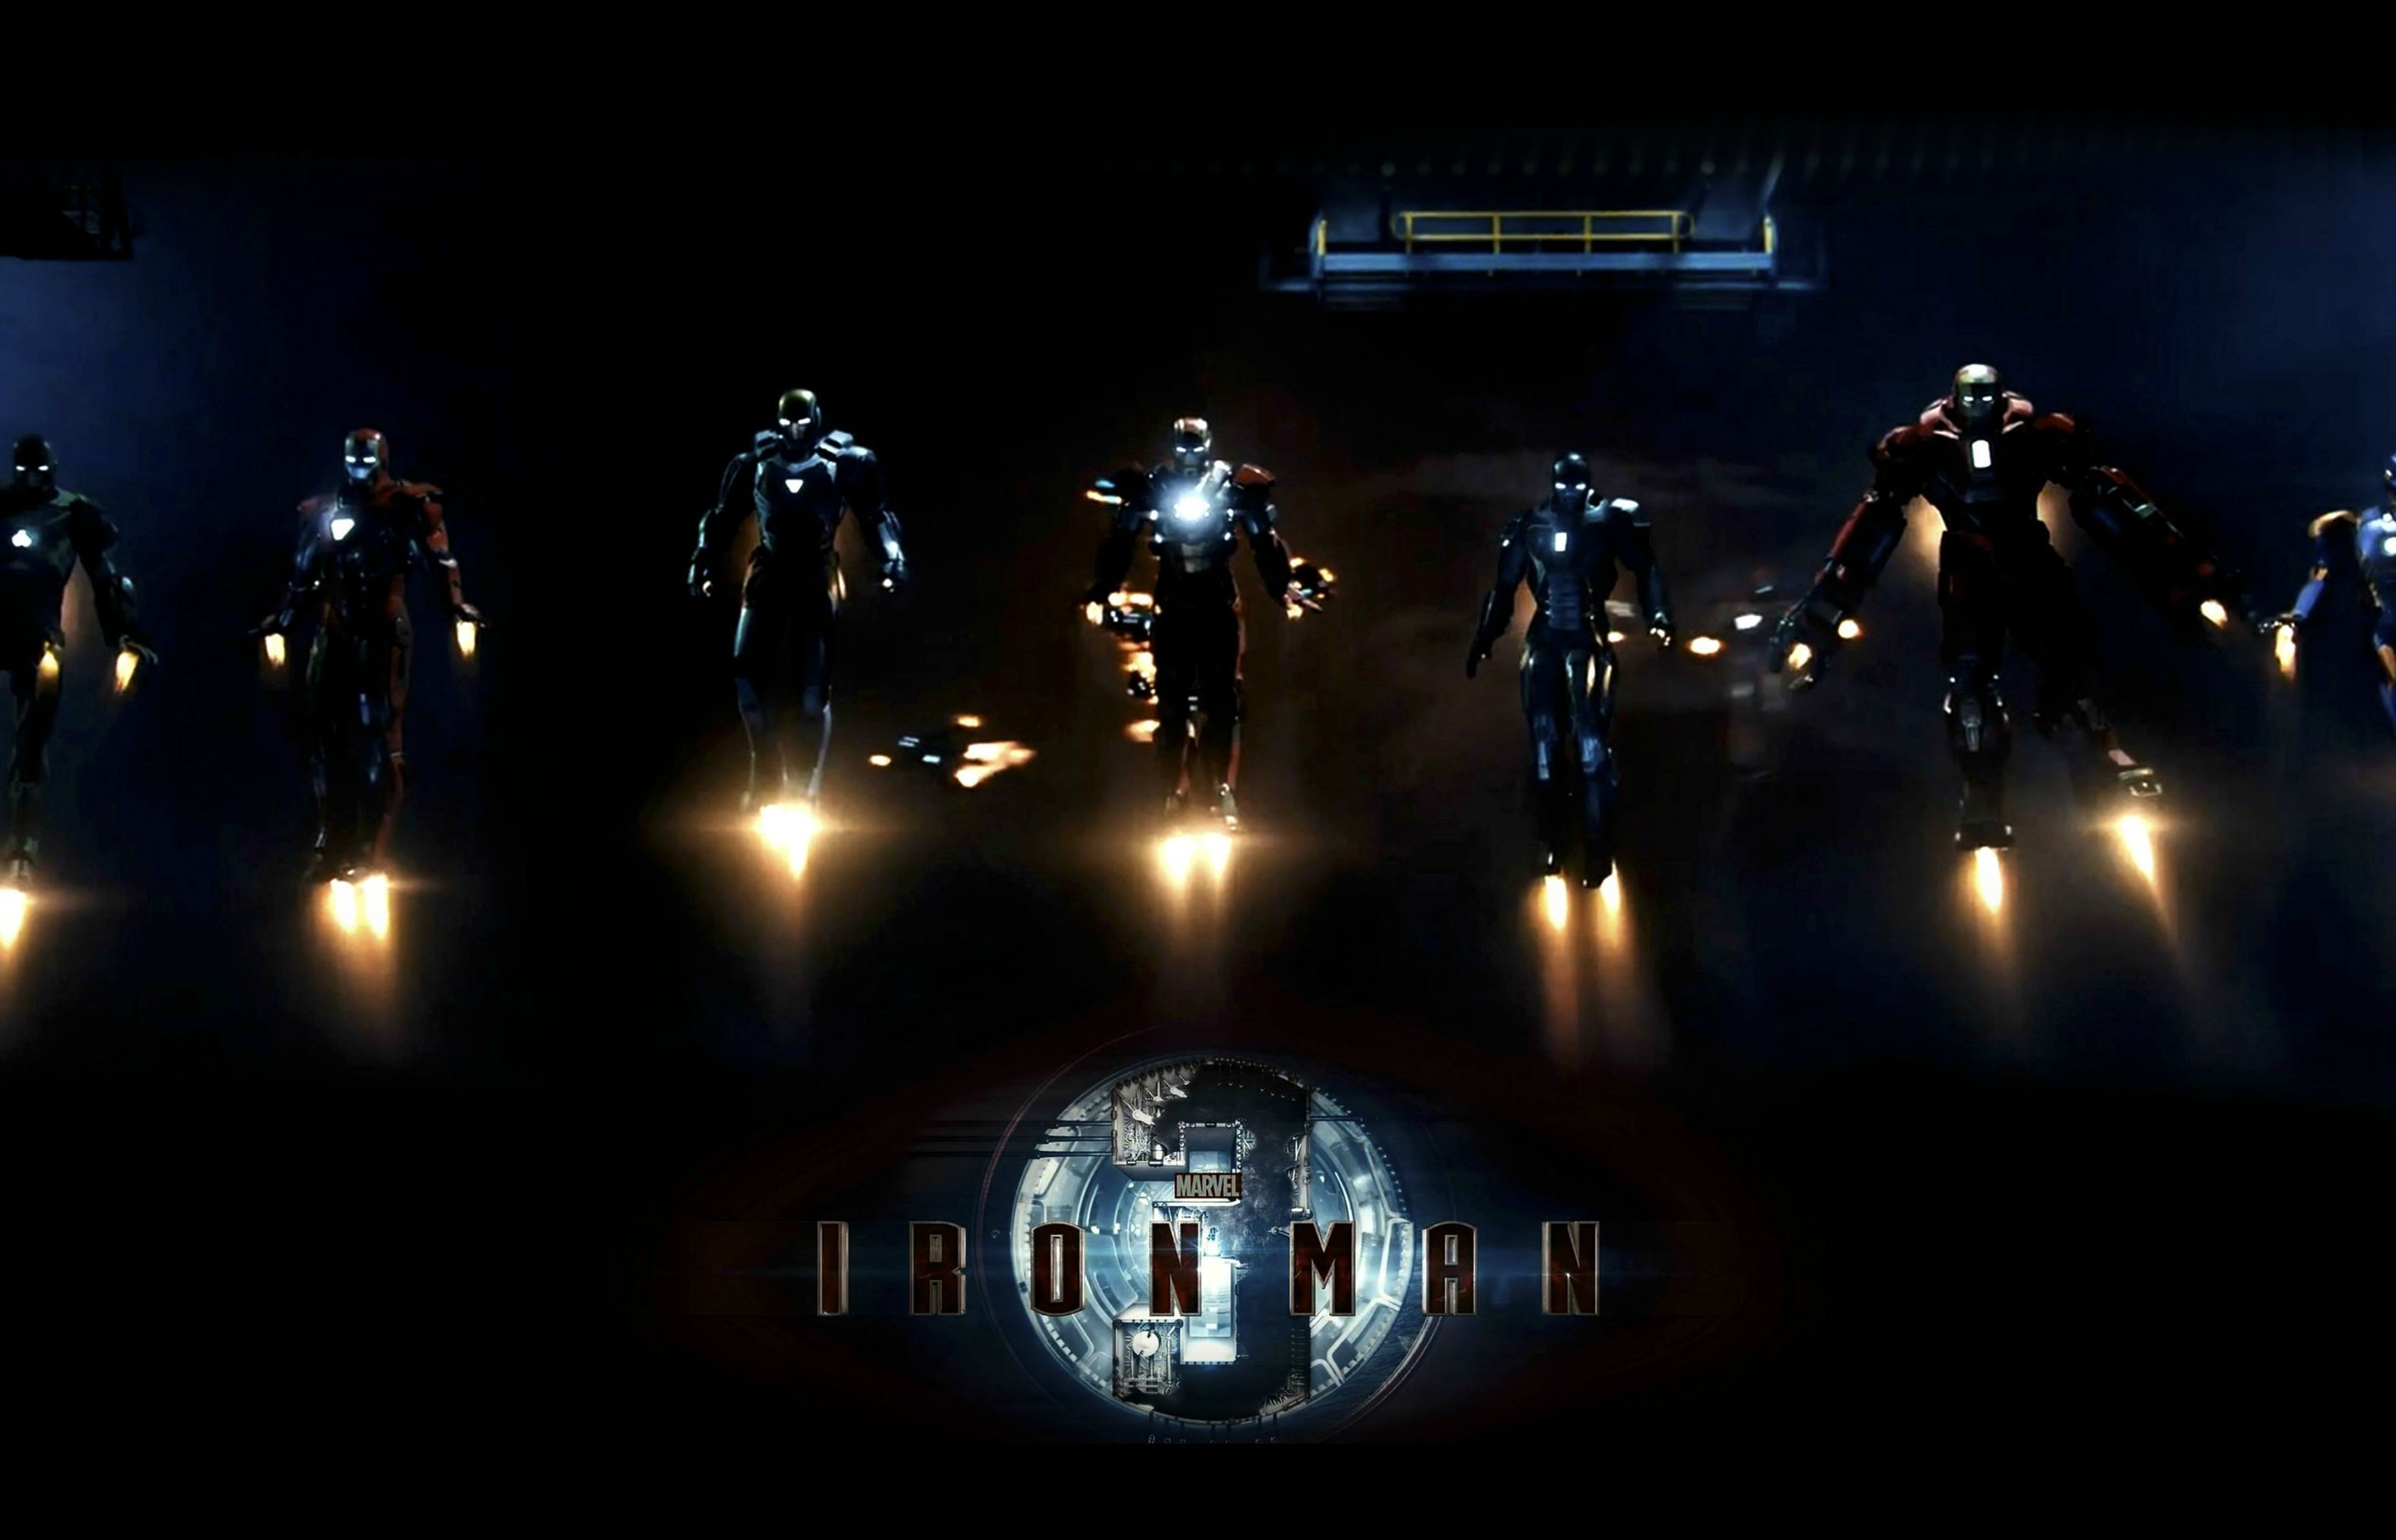 150 Iron Man HD Wallpapers | Backgrounds – Wallpaper Abyss | Best Games  Wallpapers | Pinterest | Iron man wallpaper, Man wallpaper and Hd wallpaper